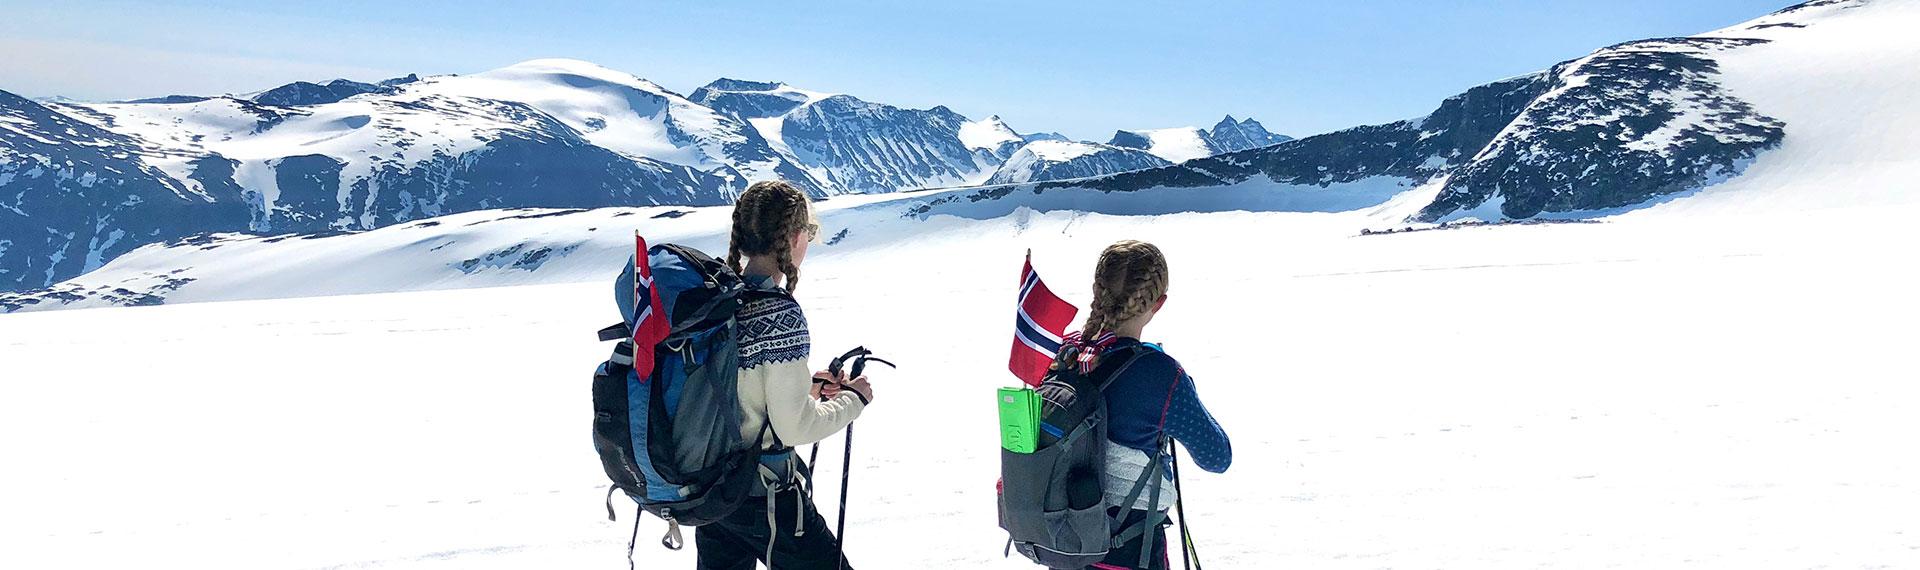 Galdhøpiggen, Norway